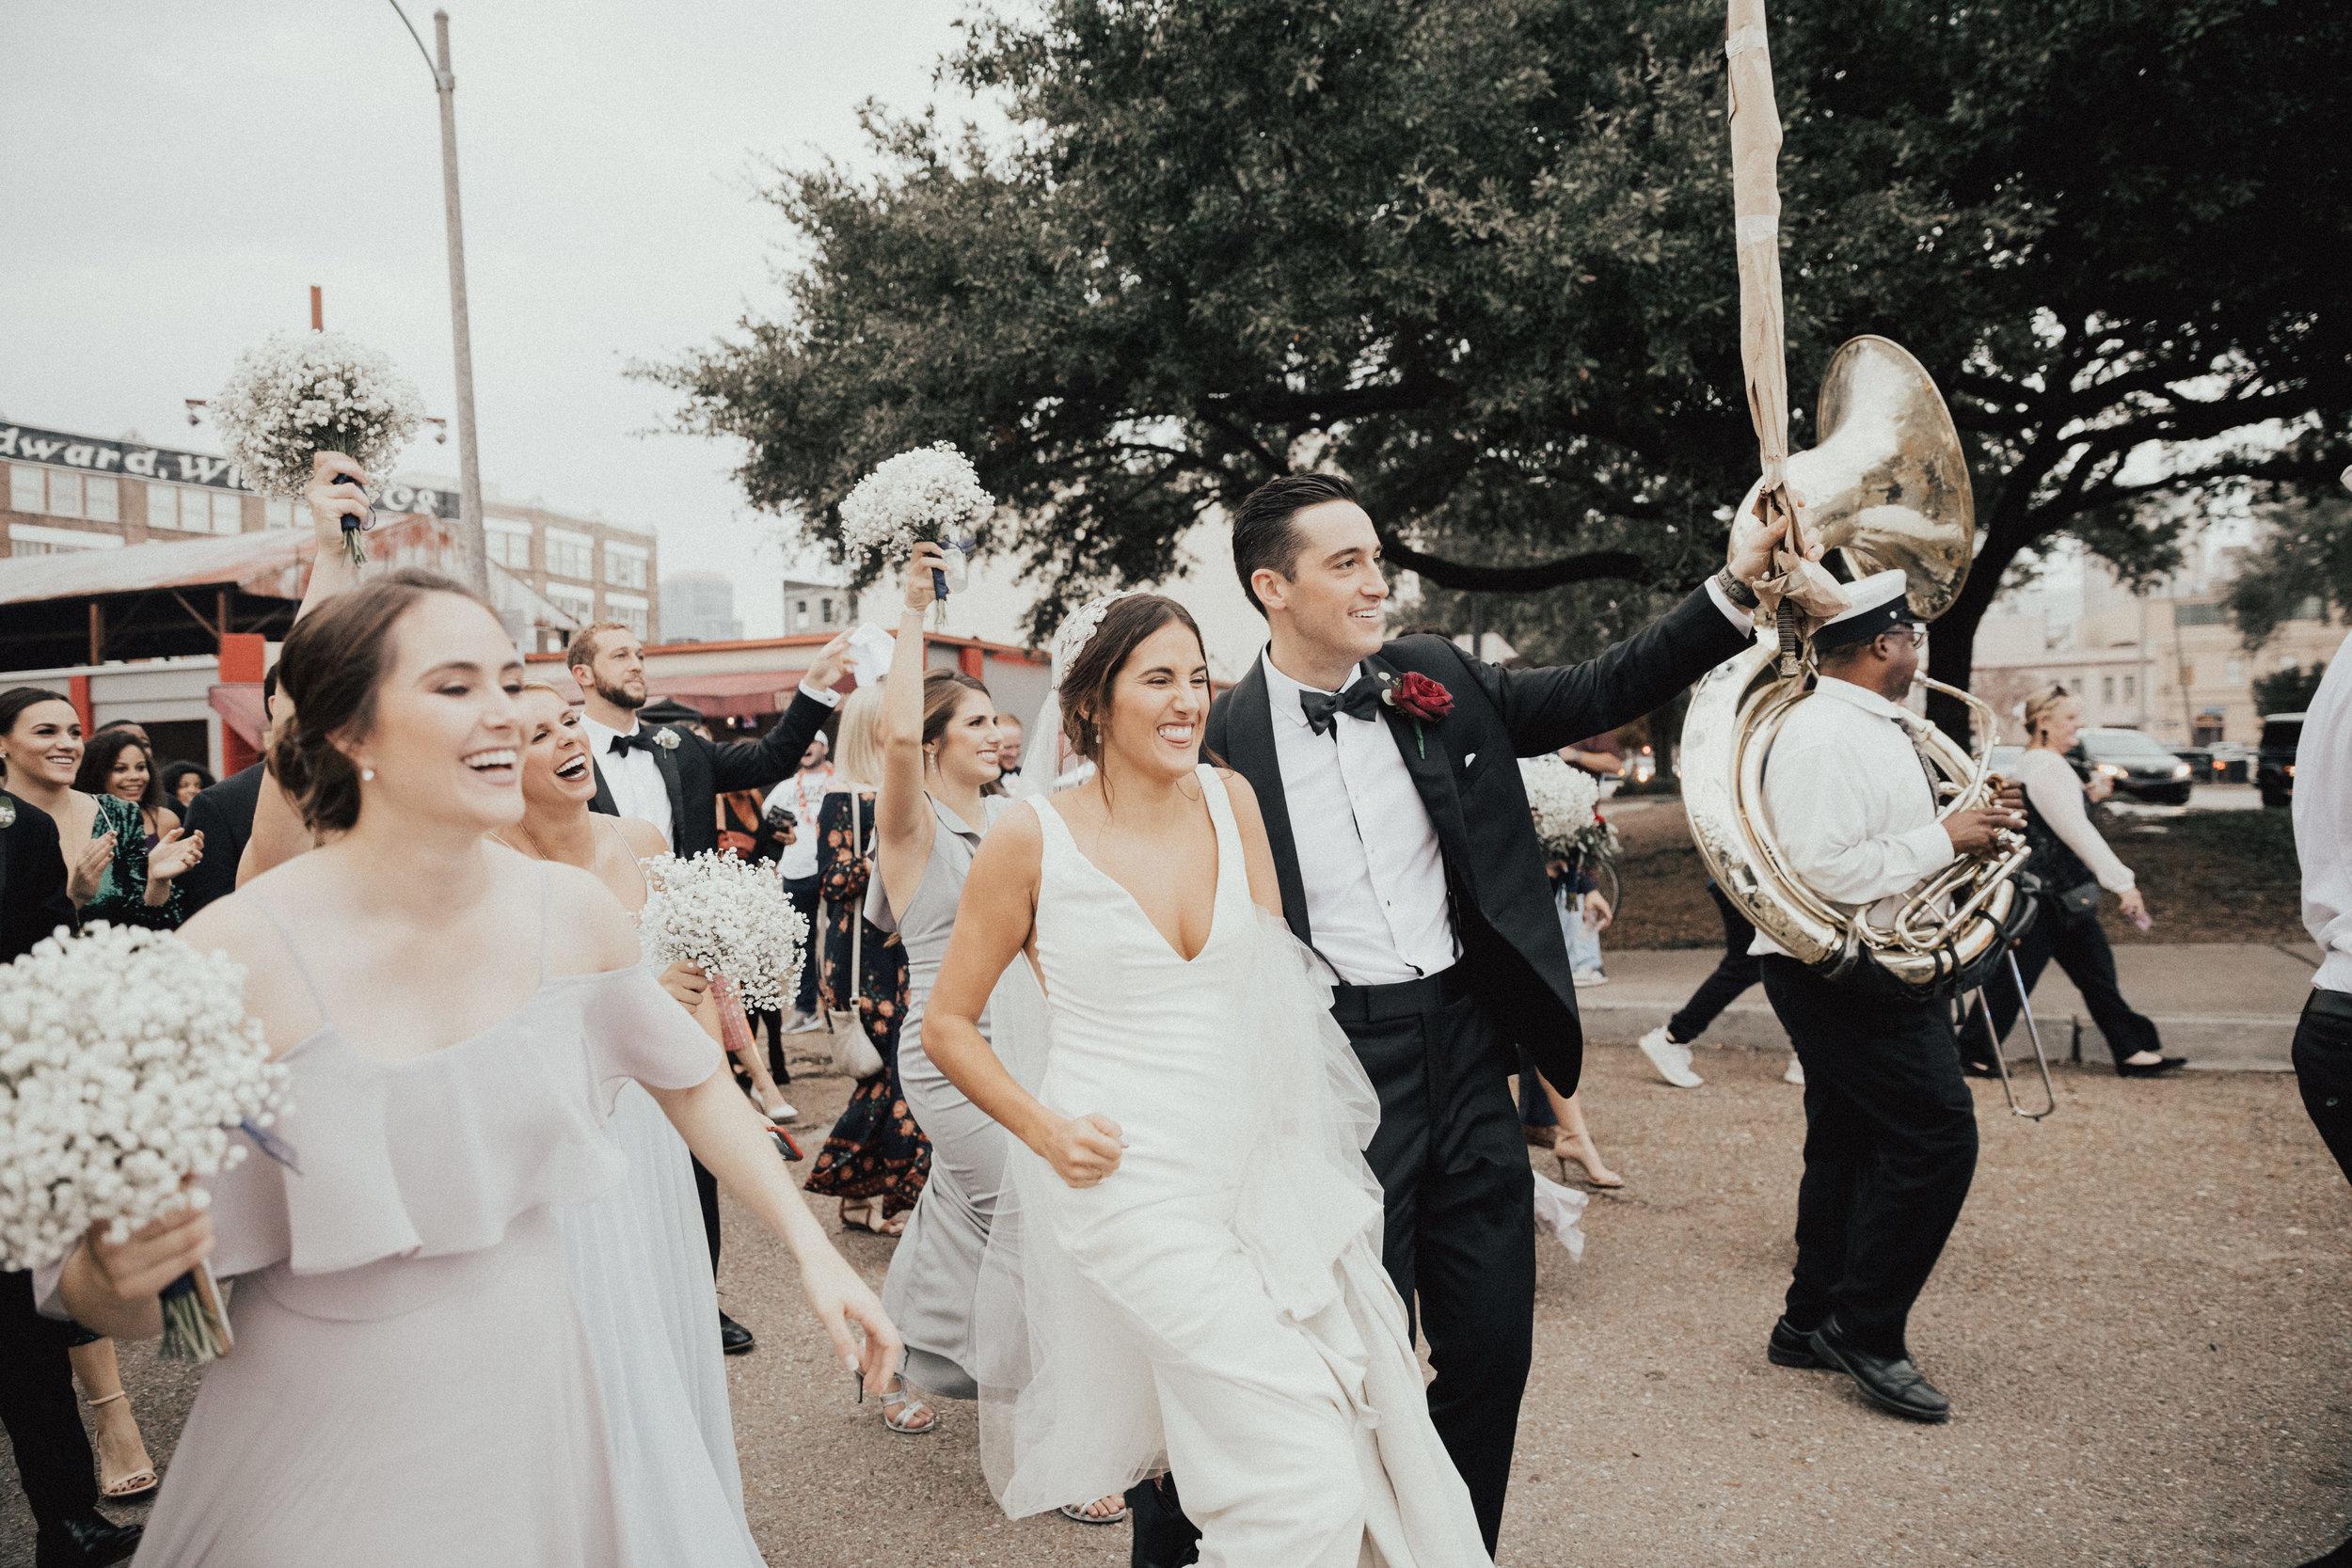 magners wedding (86 of 145).jpg